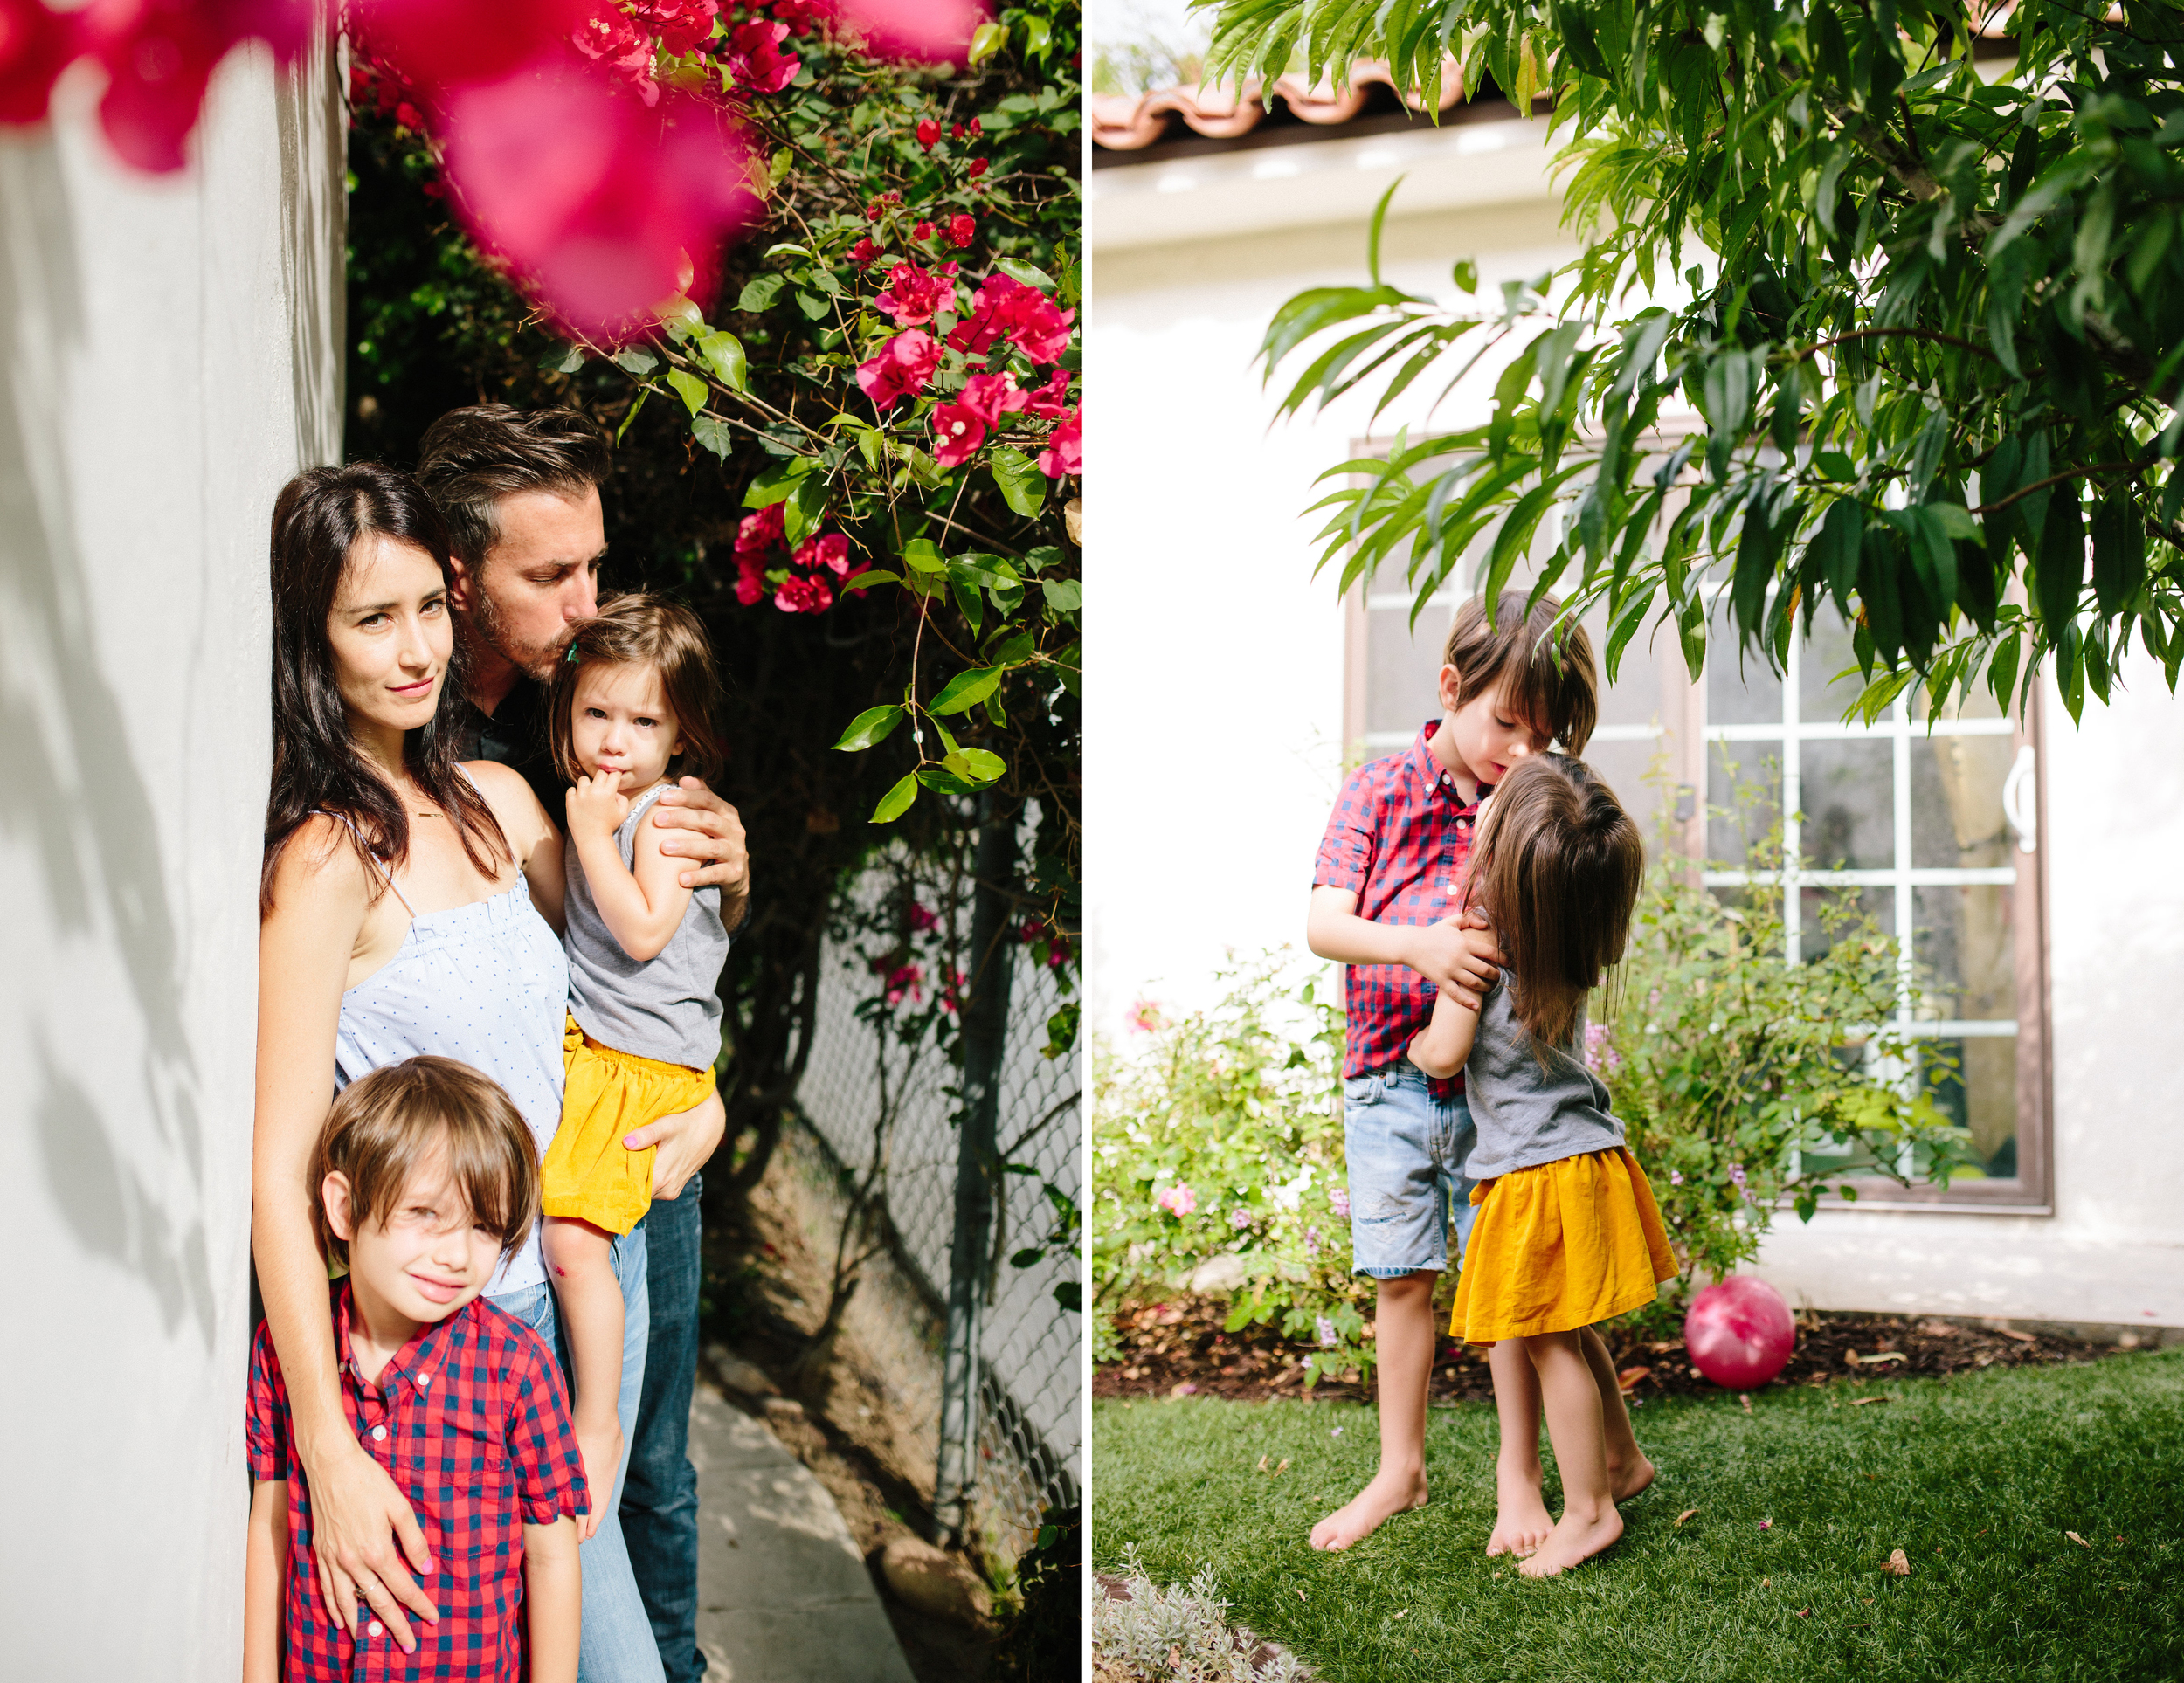 los-angeles-lifestyle-family-child-kid-baby-photographer_2.jpg